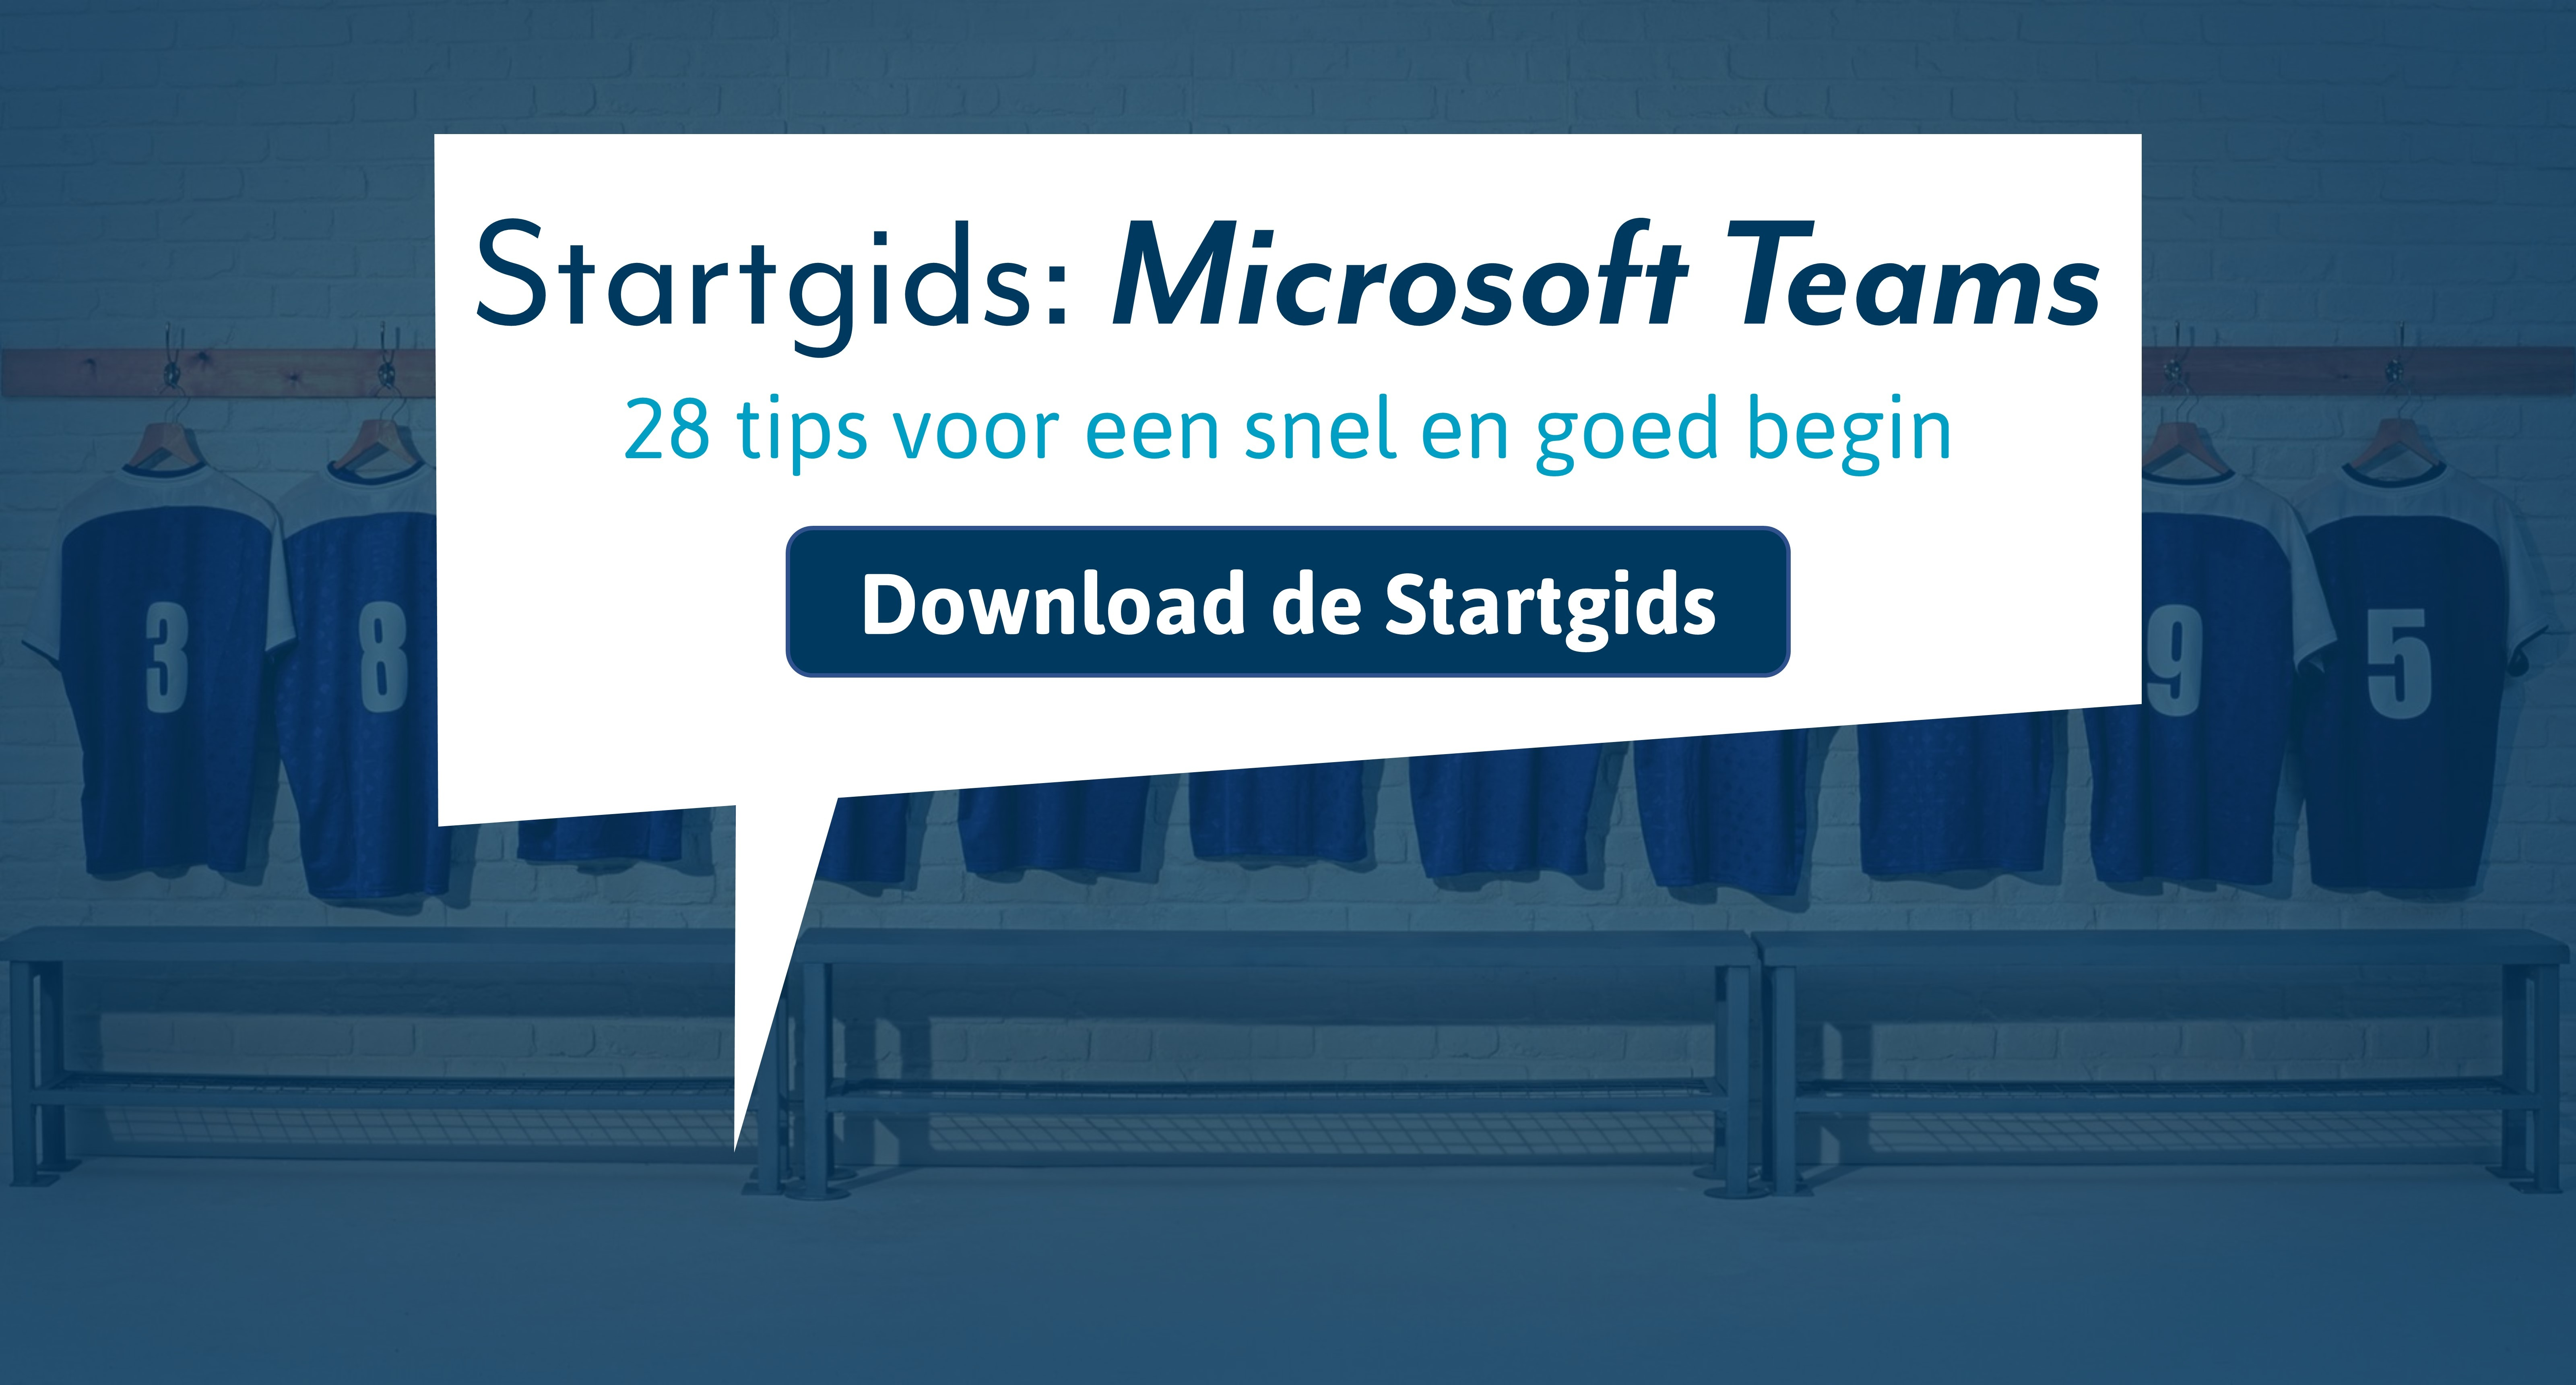 Startgids: Microsoft Teams